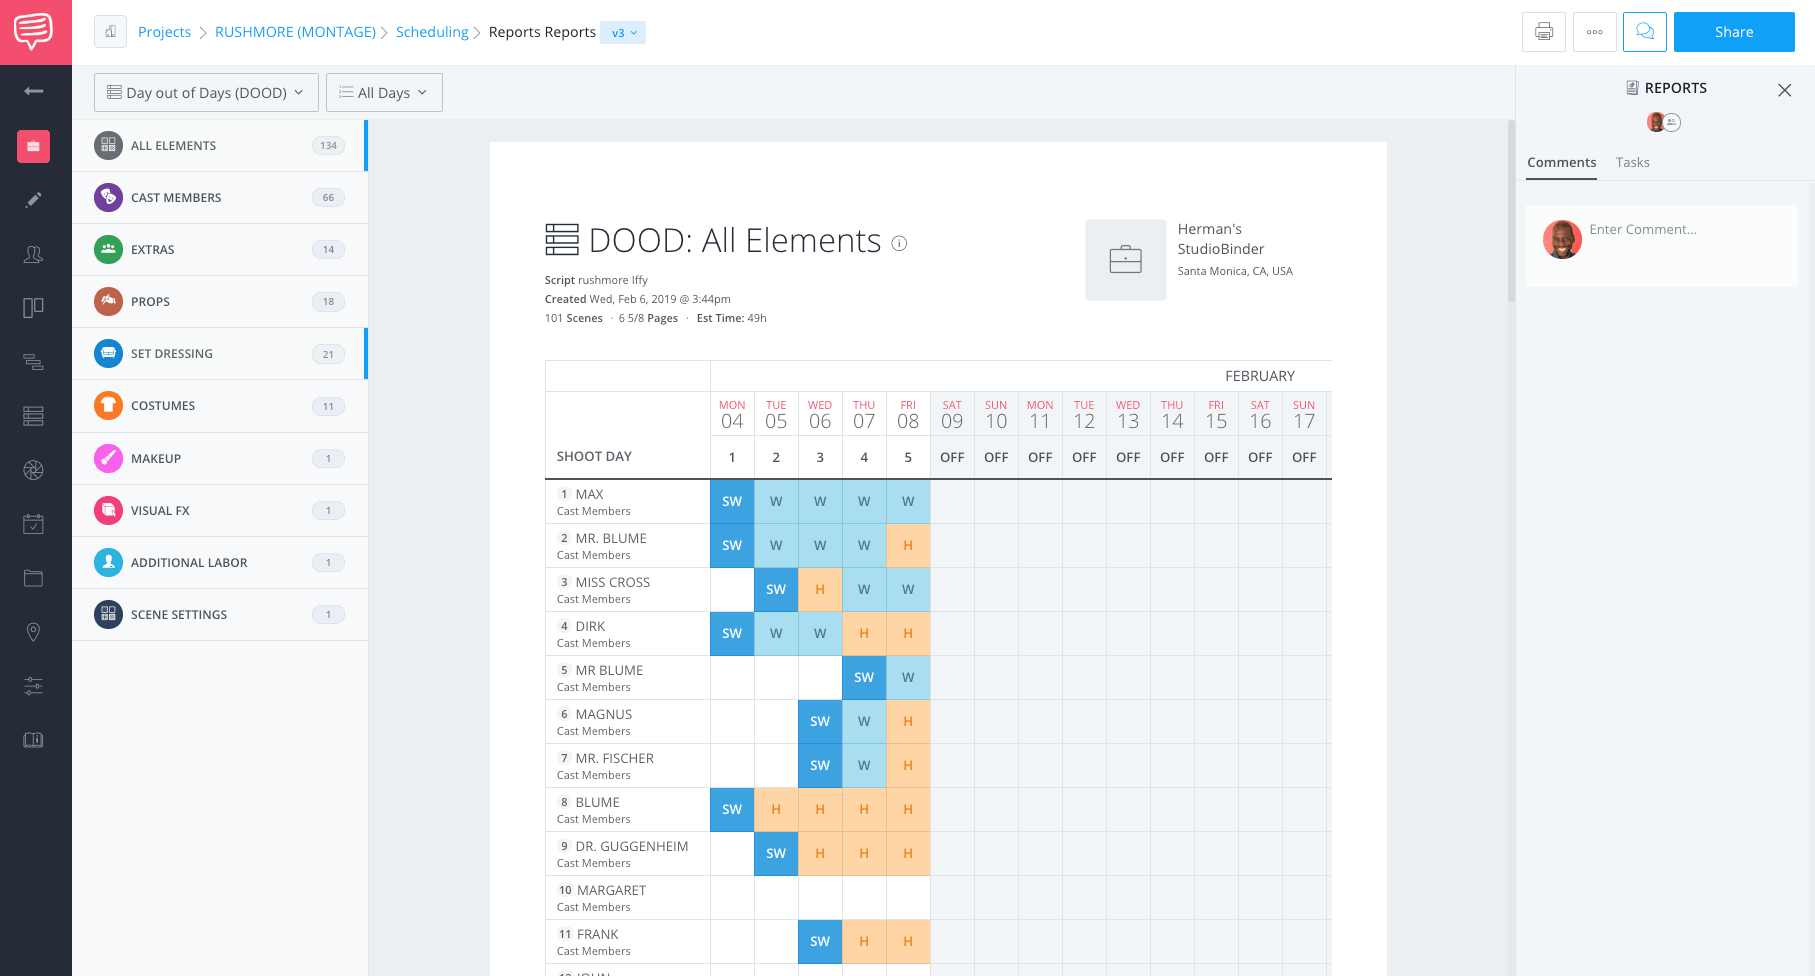 Shooting Schedule - What is a montage - dood report - Studiobinder